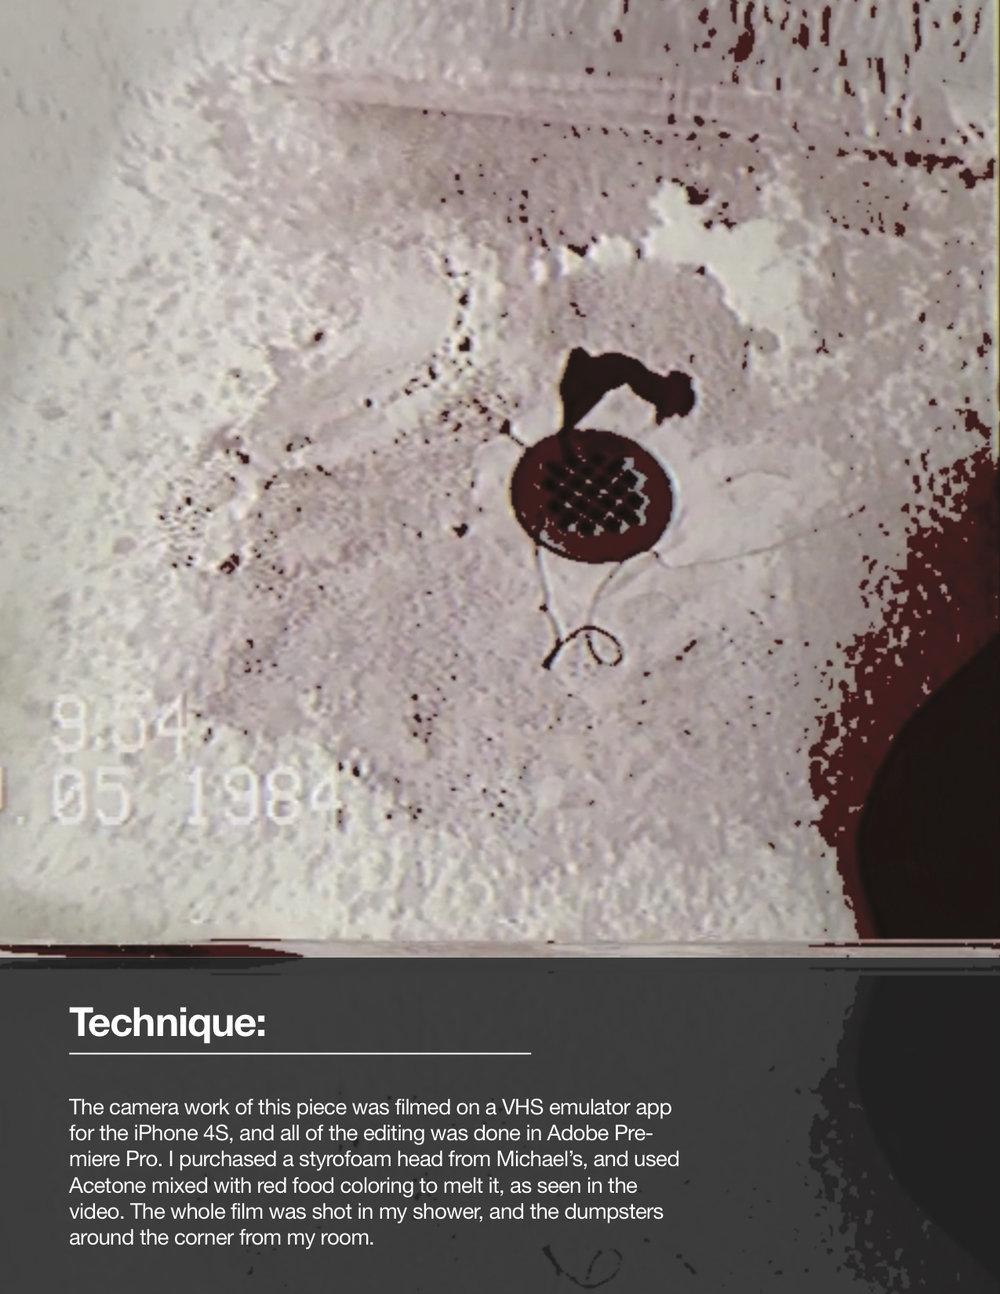 TechniqueDIY.jpg